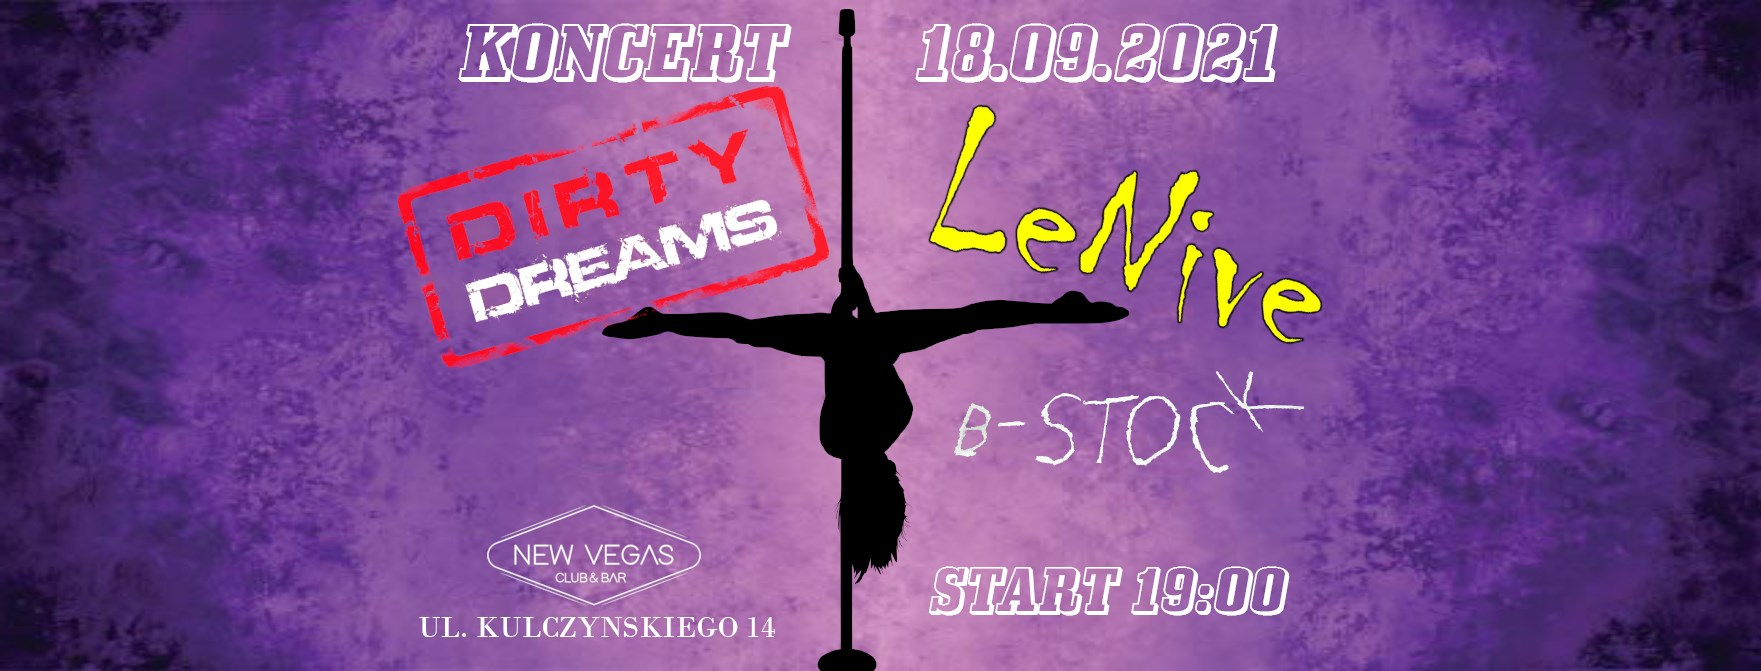 Dirty Dreams x B-Stock x LeniVe